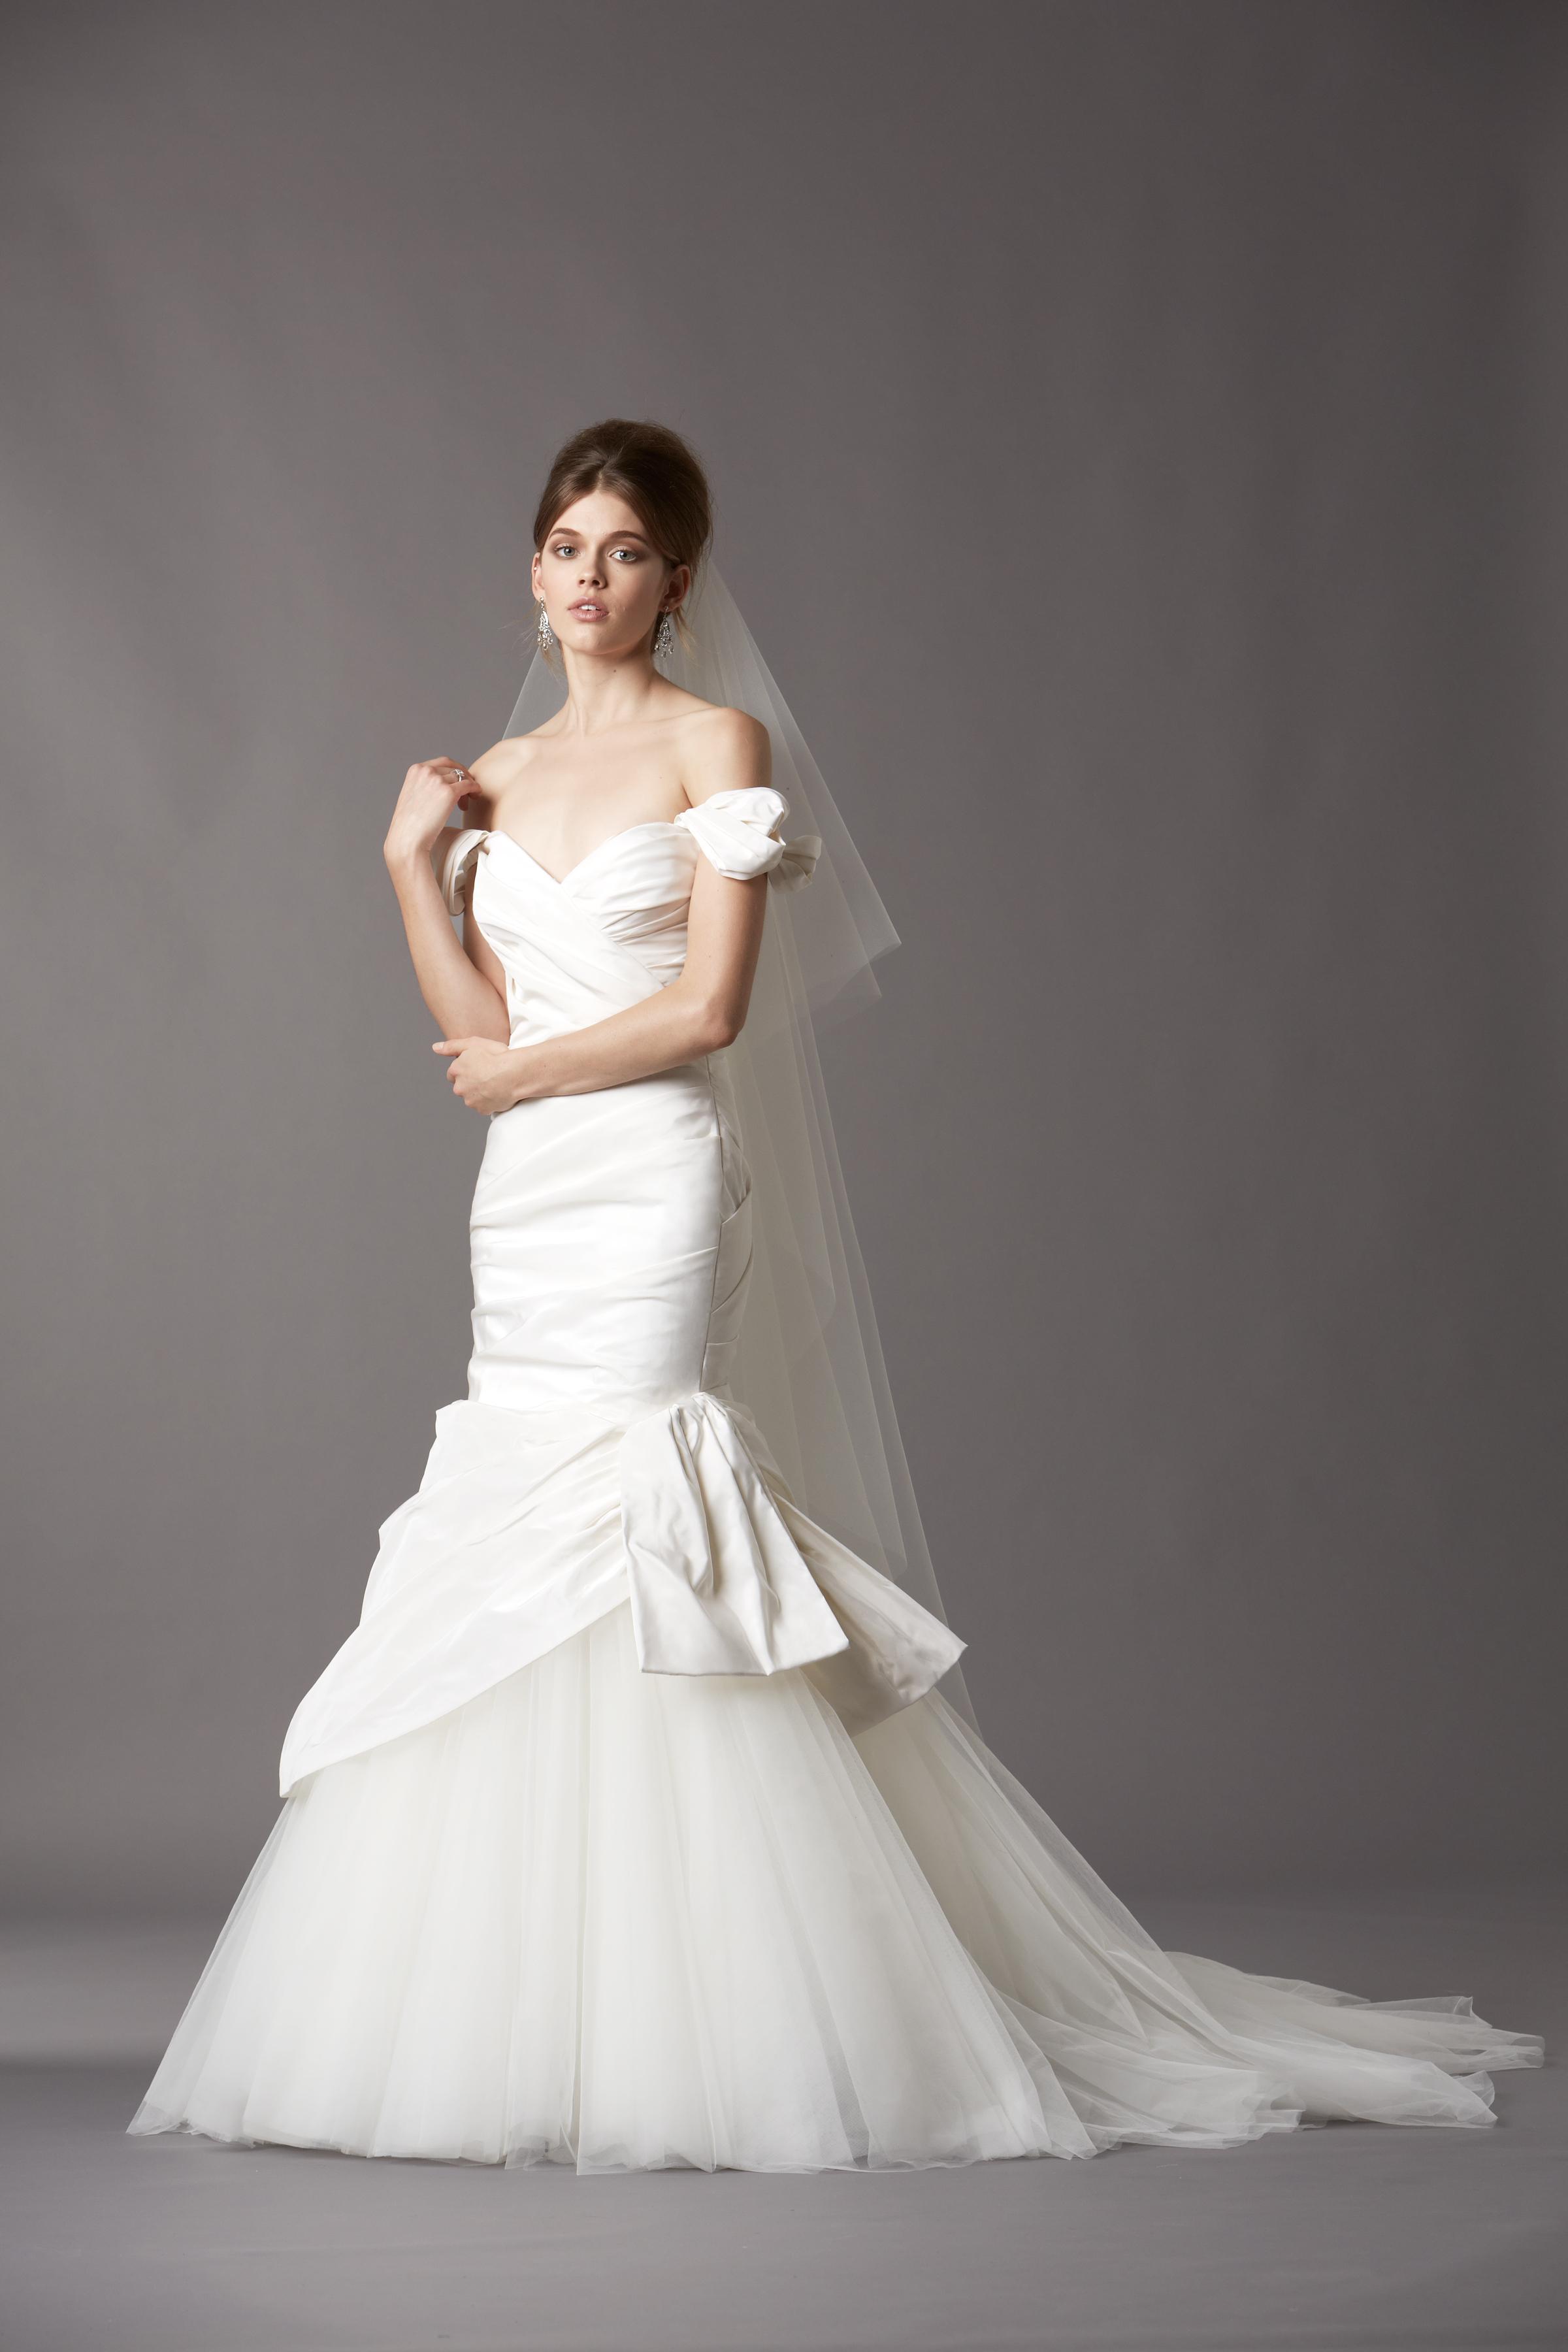 Wedding Dresses, Mermaid Wedding Dresses, Fashion, Classic Weddings, Glam Weddings, Watters, Off the Shoulder Wedding Dresses